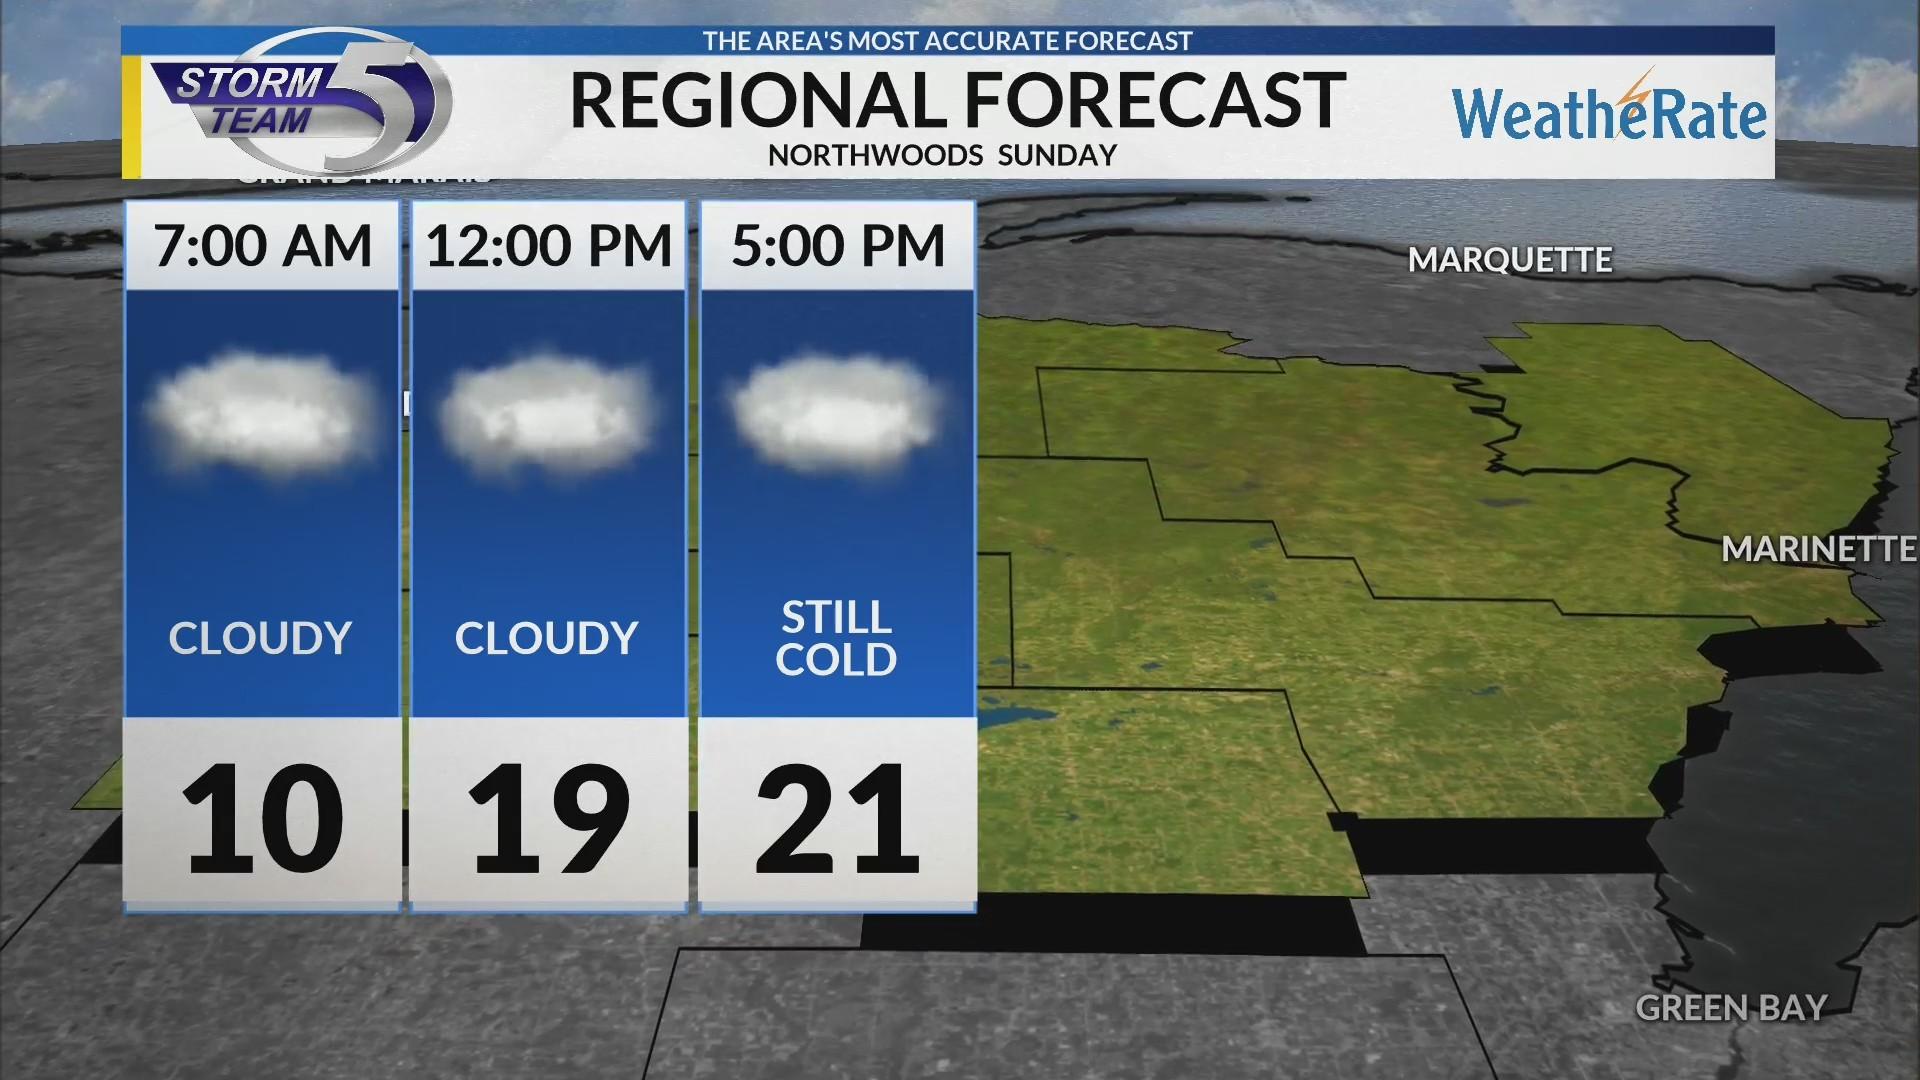 Regional Forecast: Northwoods 2/17/2019